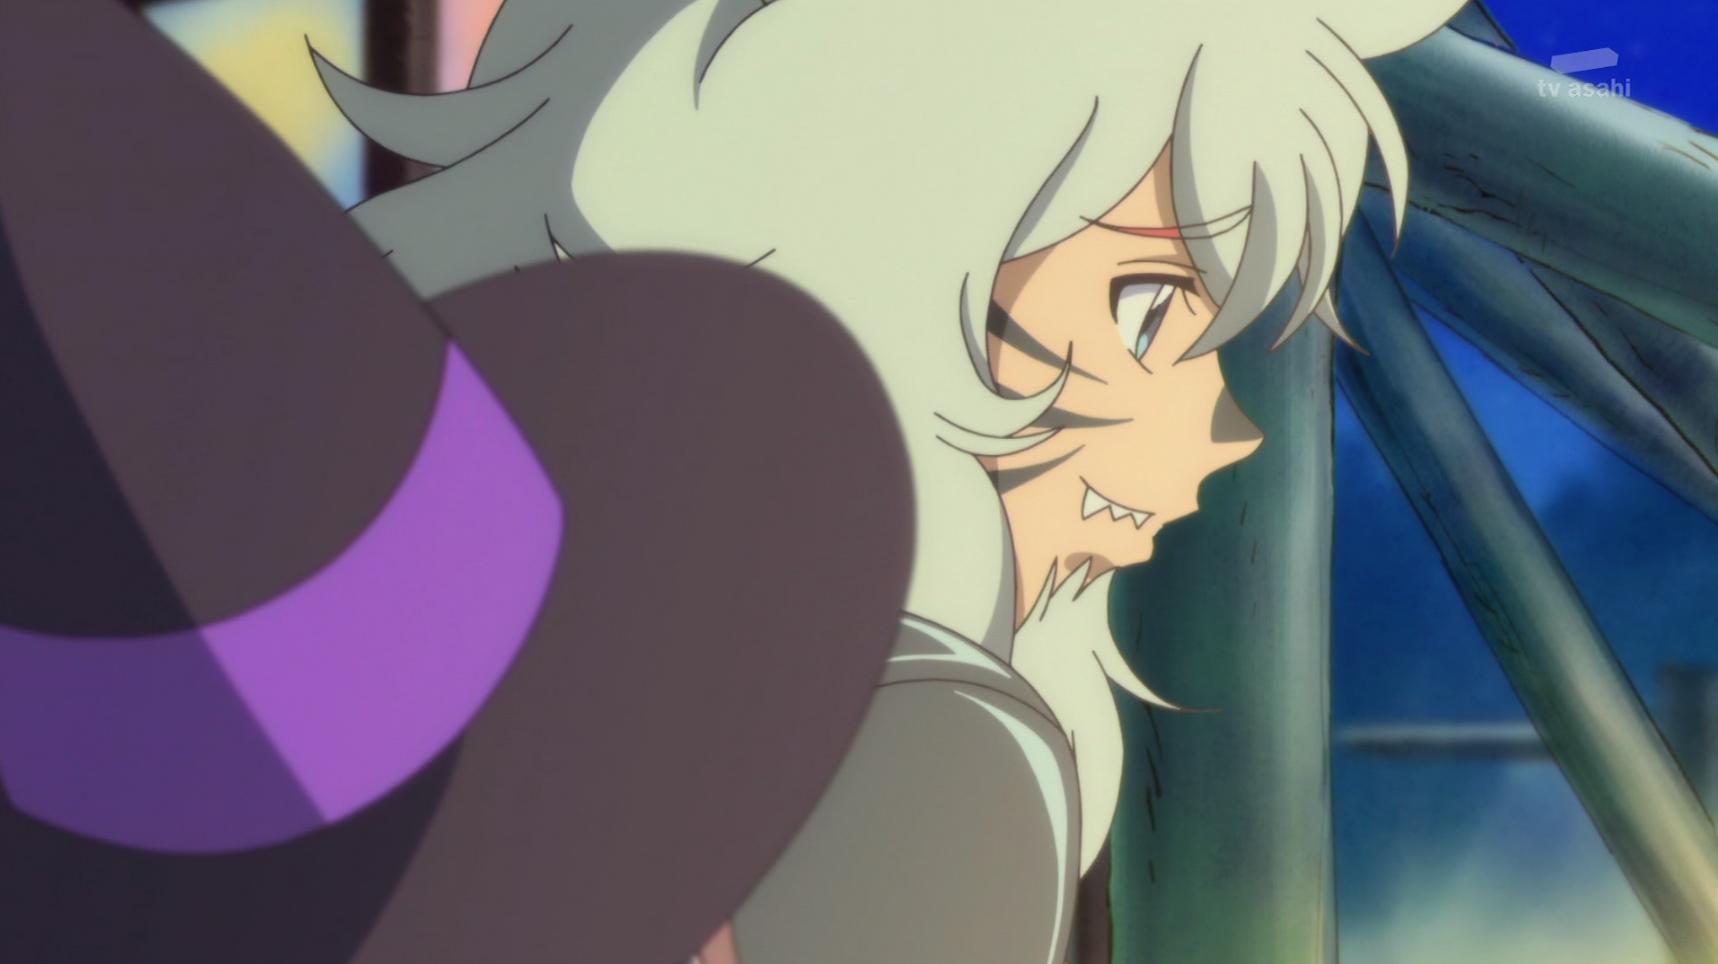 HUGっとプリキュア第38話感想ネタバレ1 (415)